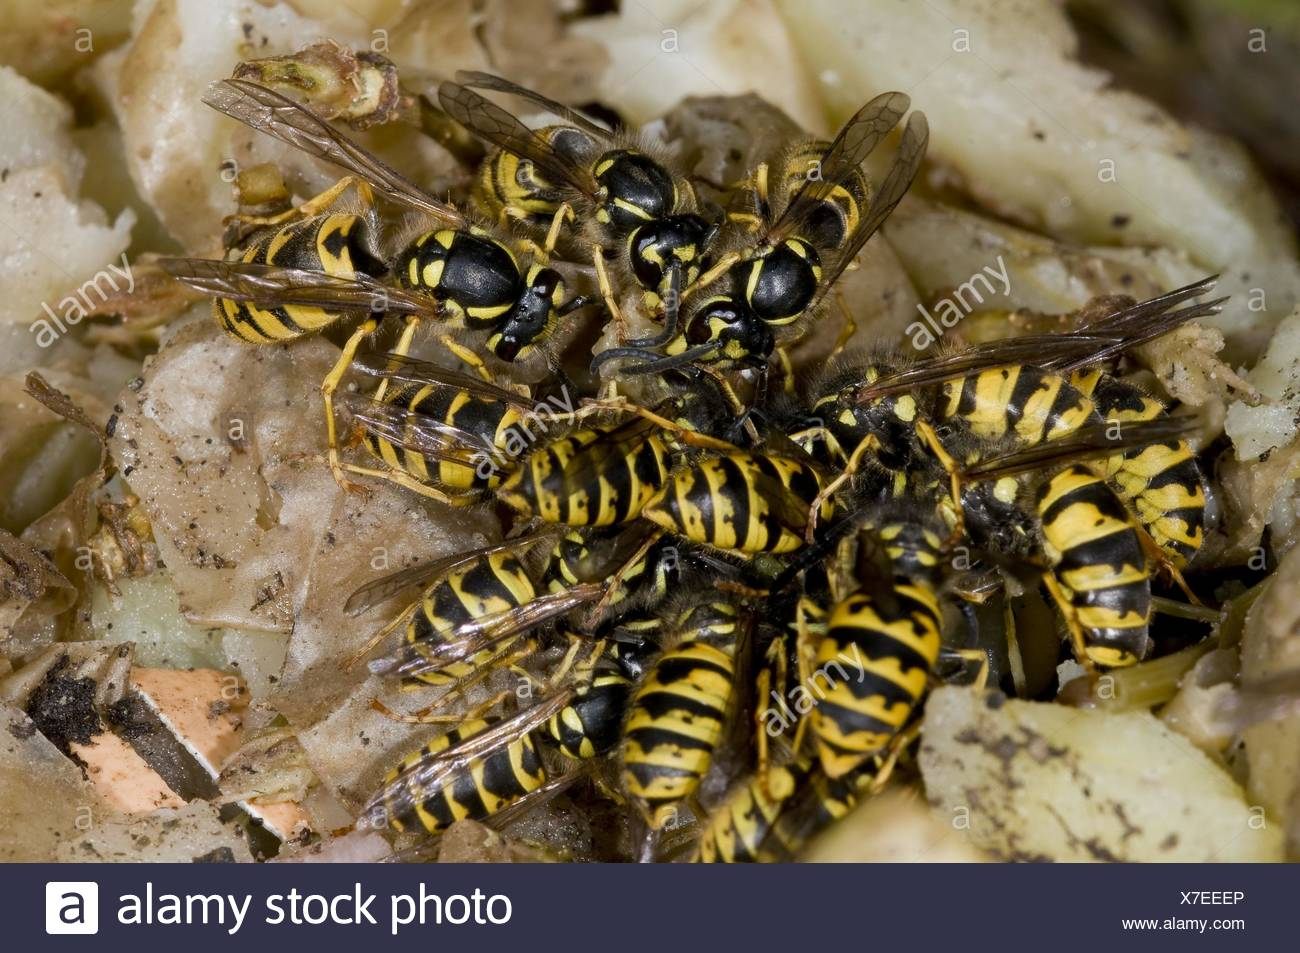 common wasps - Stock Image